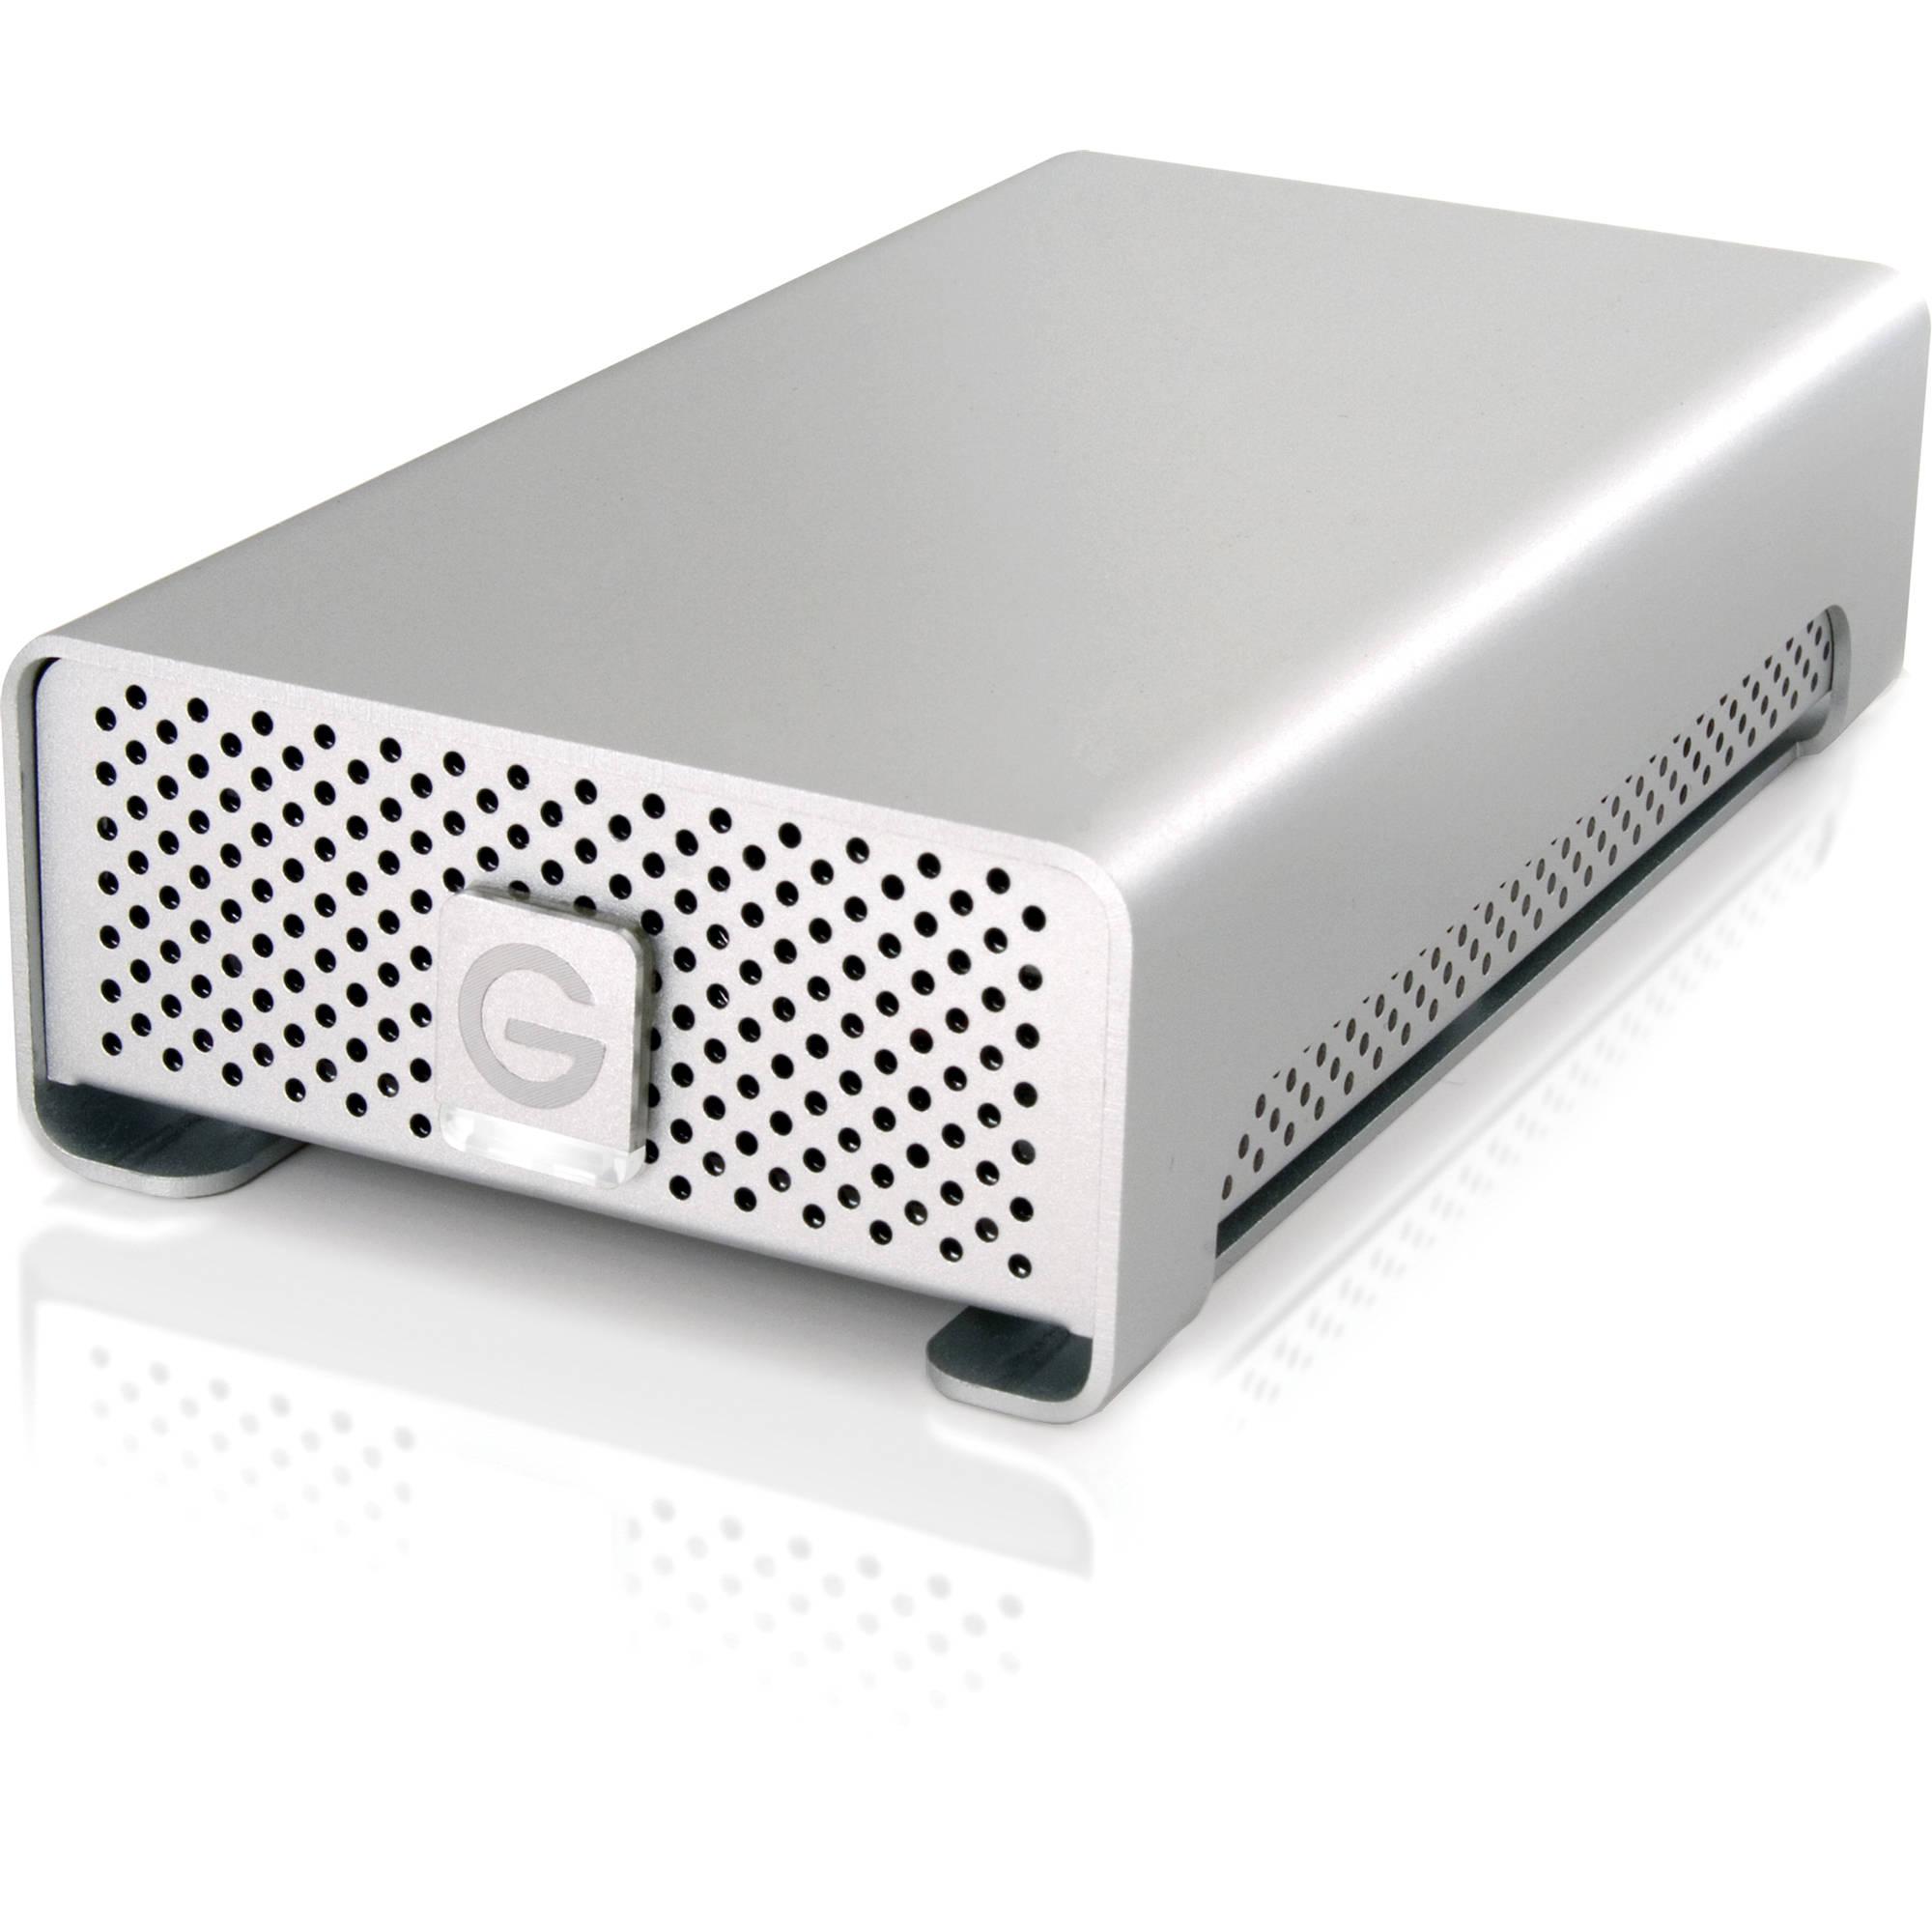 G-Technology G-RAID mini 2TB Dual-Drive Storage System 0G02616